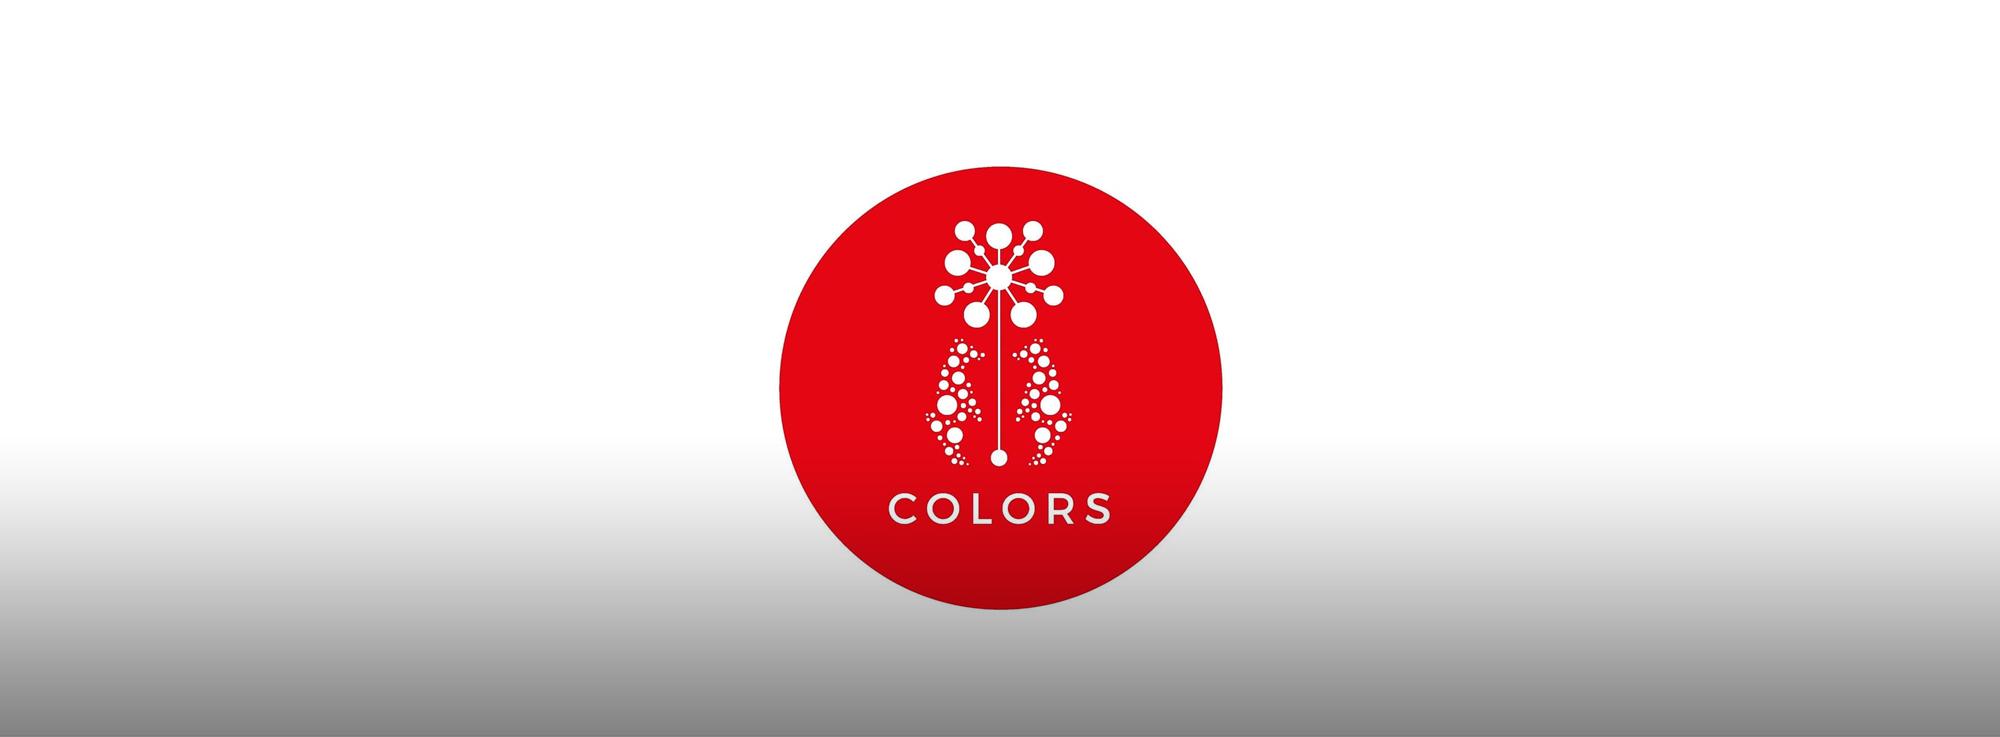 Orsara di Puglia: Colors